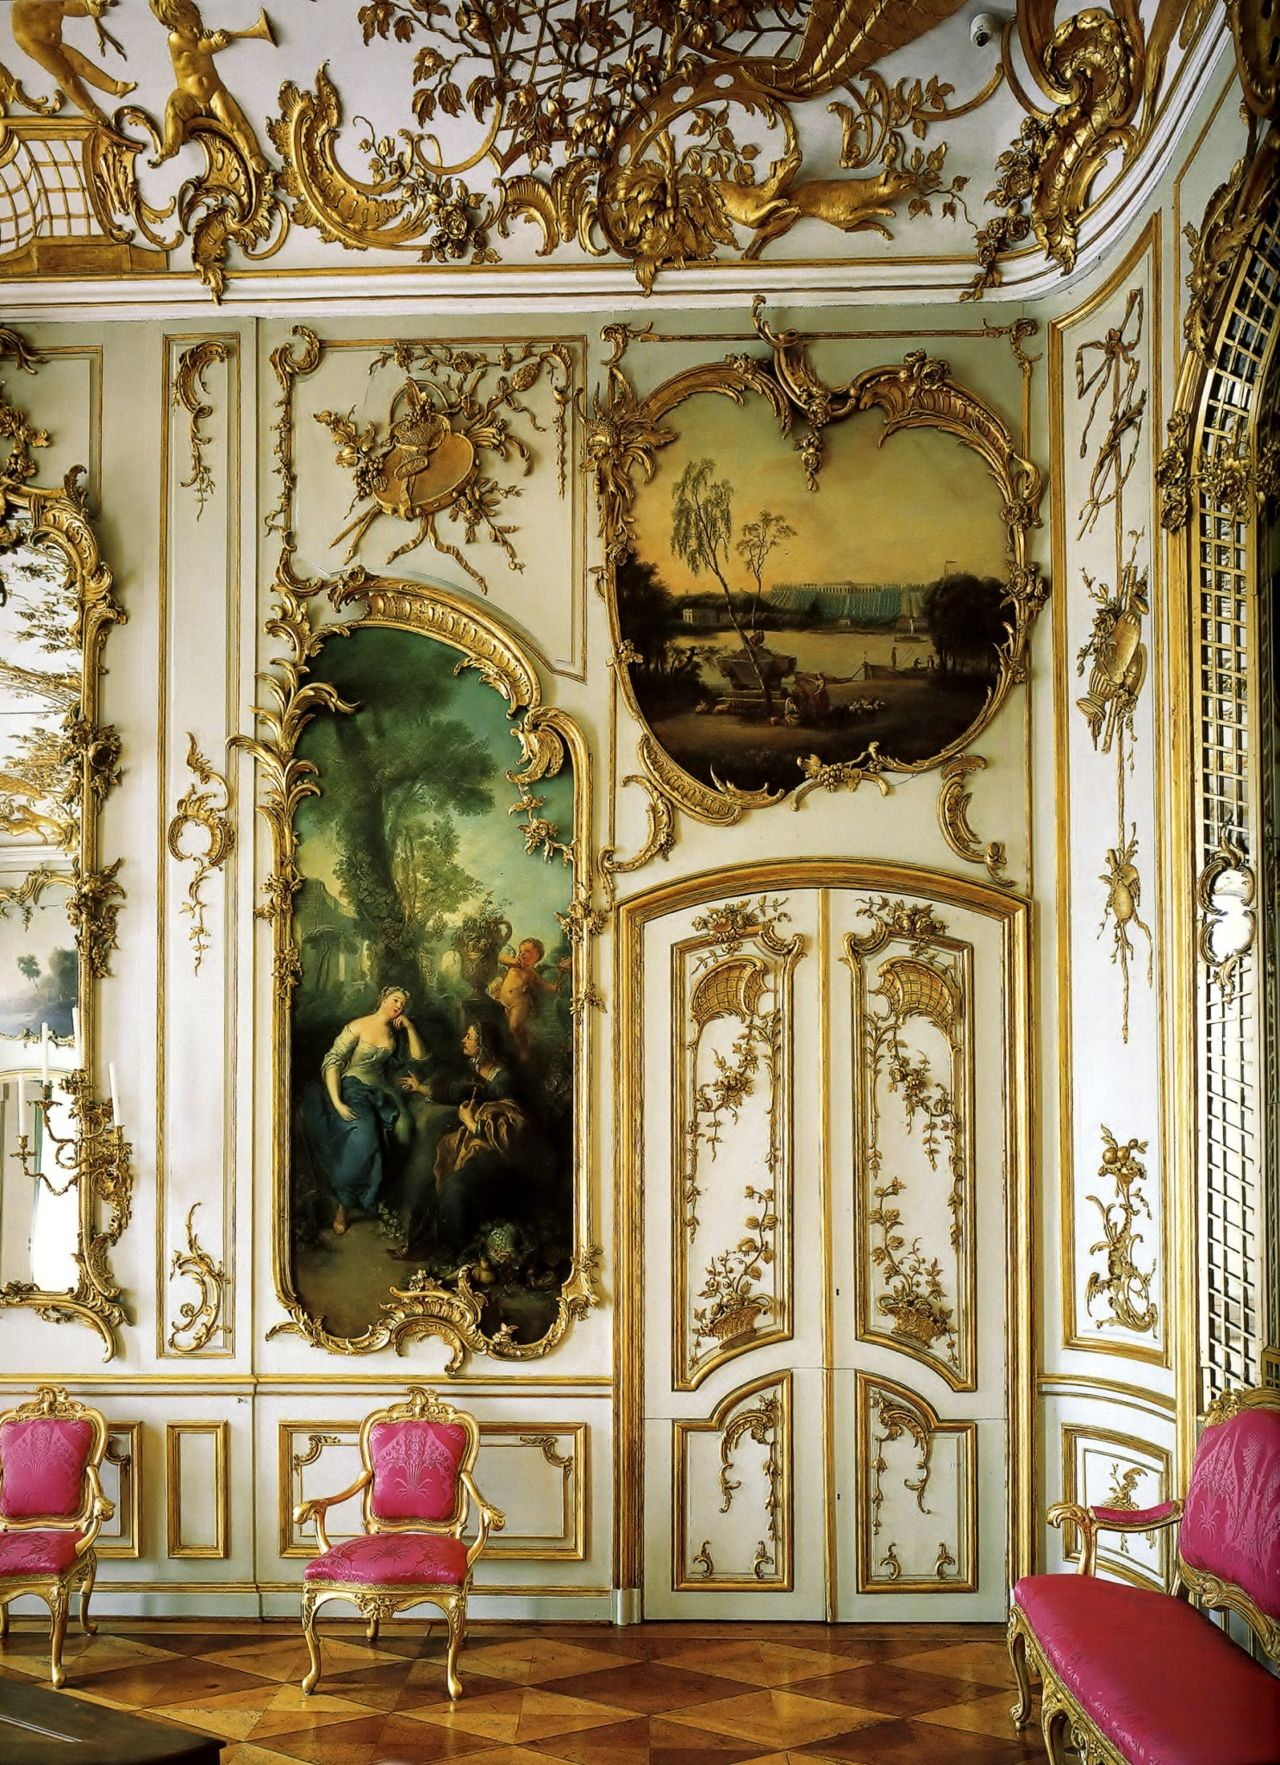 baroque interior baroque rococco art and architecture. Black Bedroom Furniture Sets. Home Design Ideas